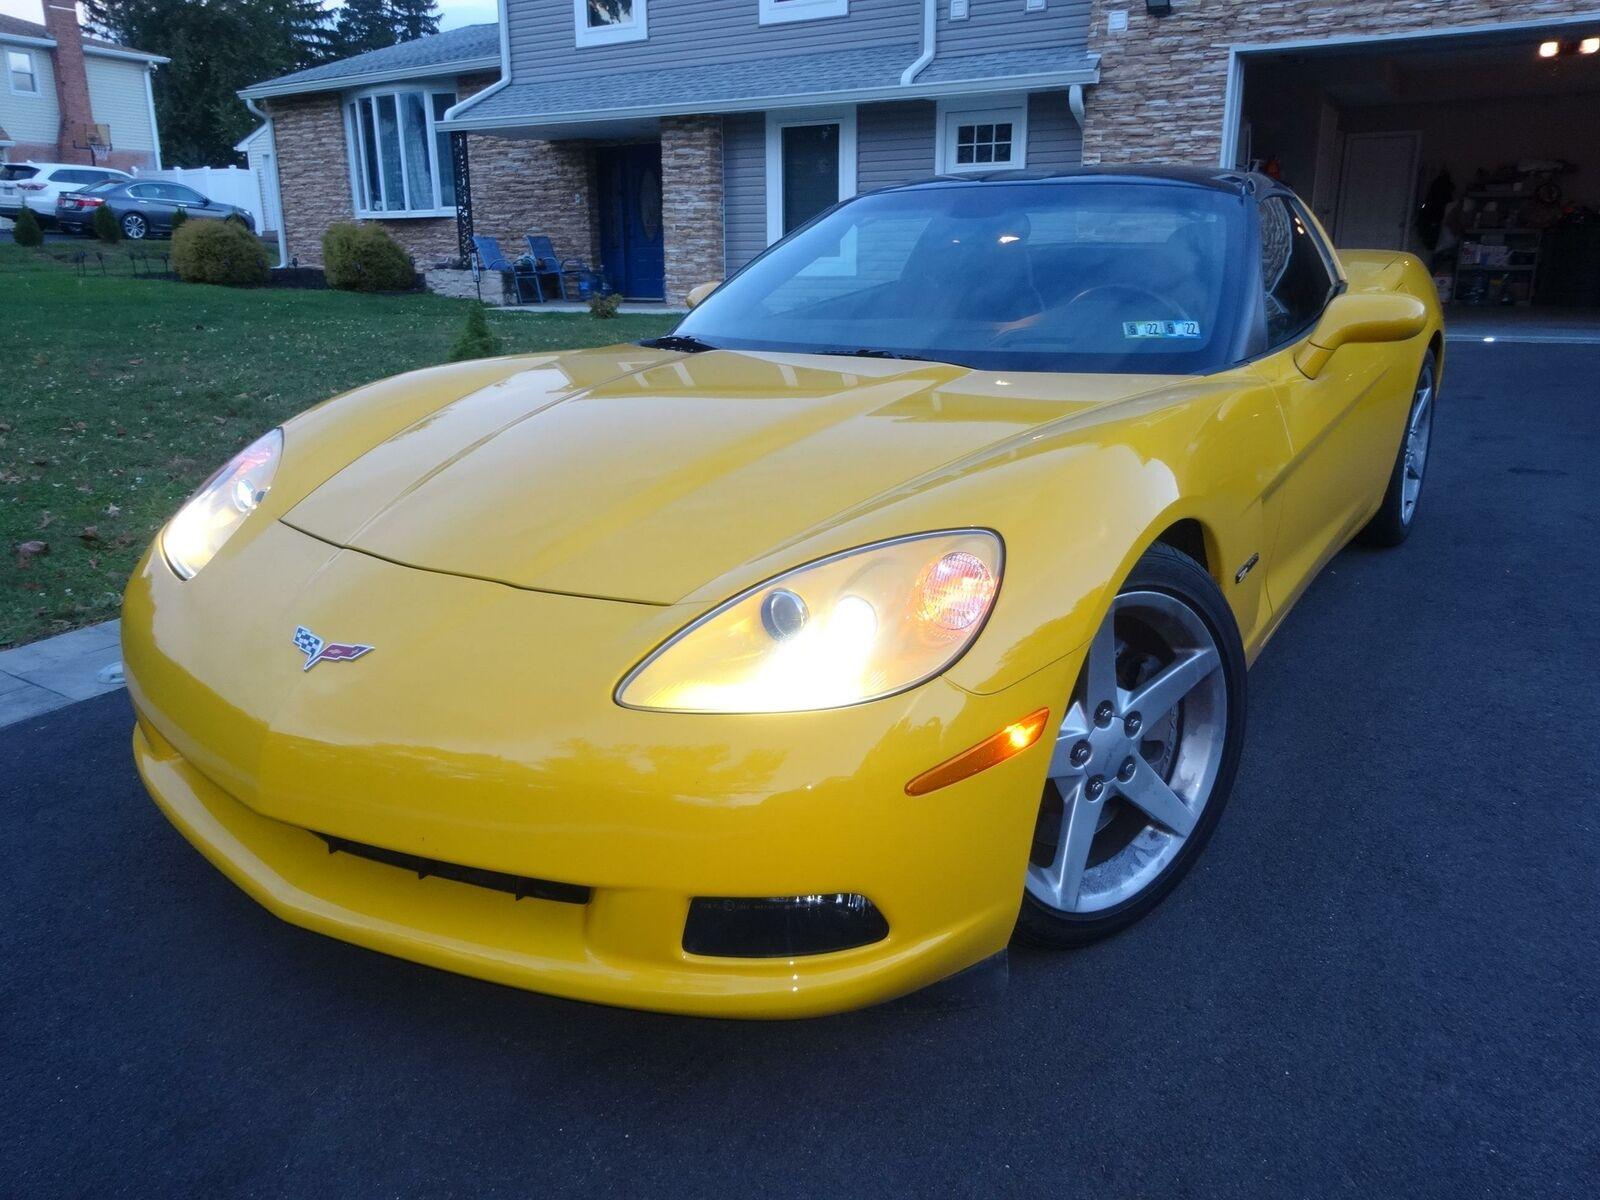 2005 Yellow Chevrolet Corvette     C6 Corvette Photo 2